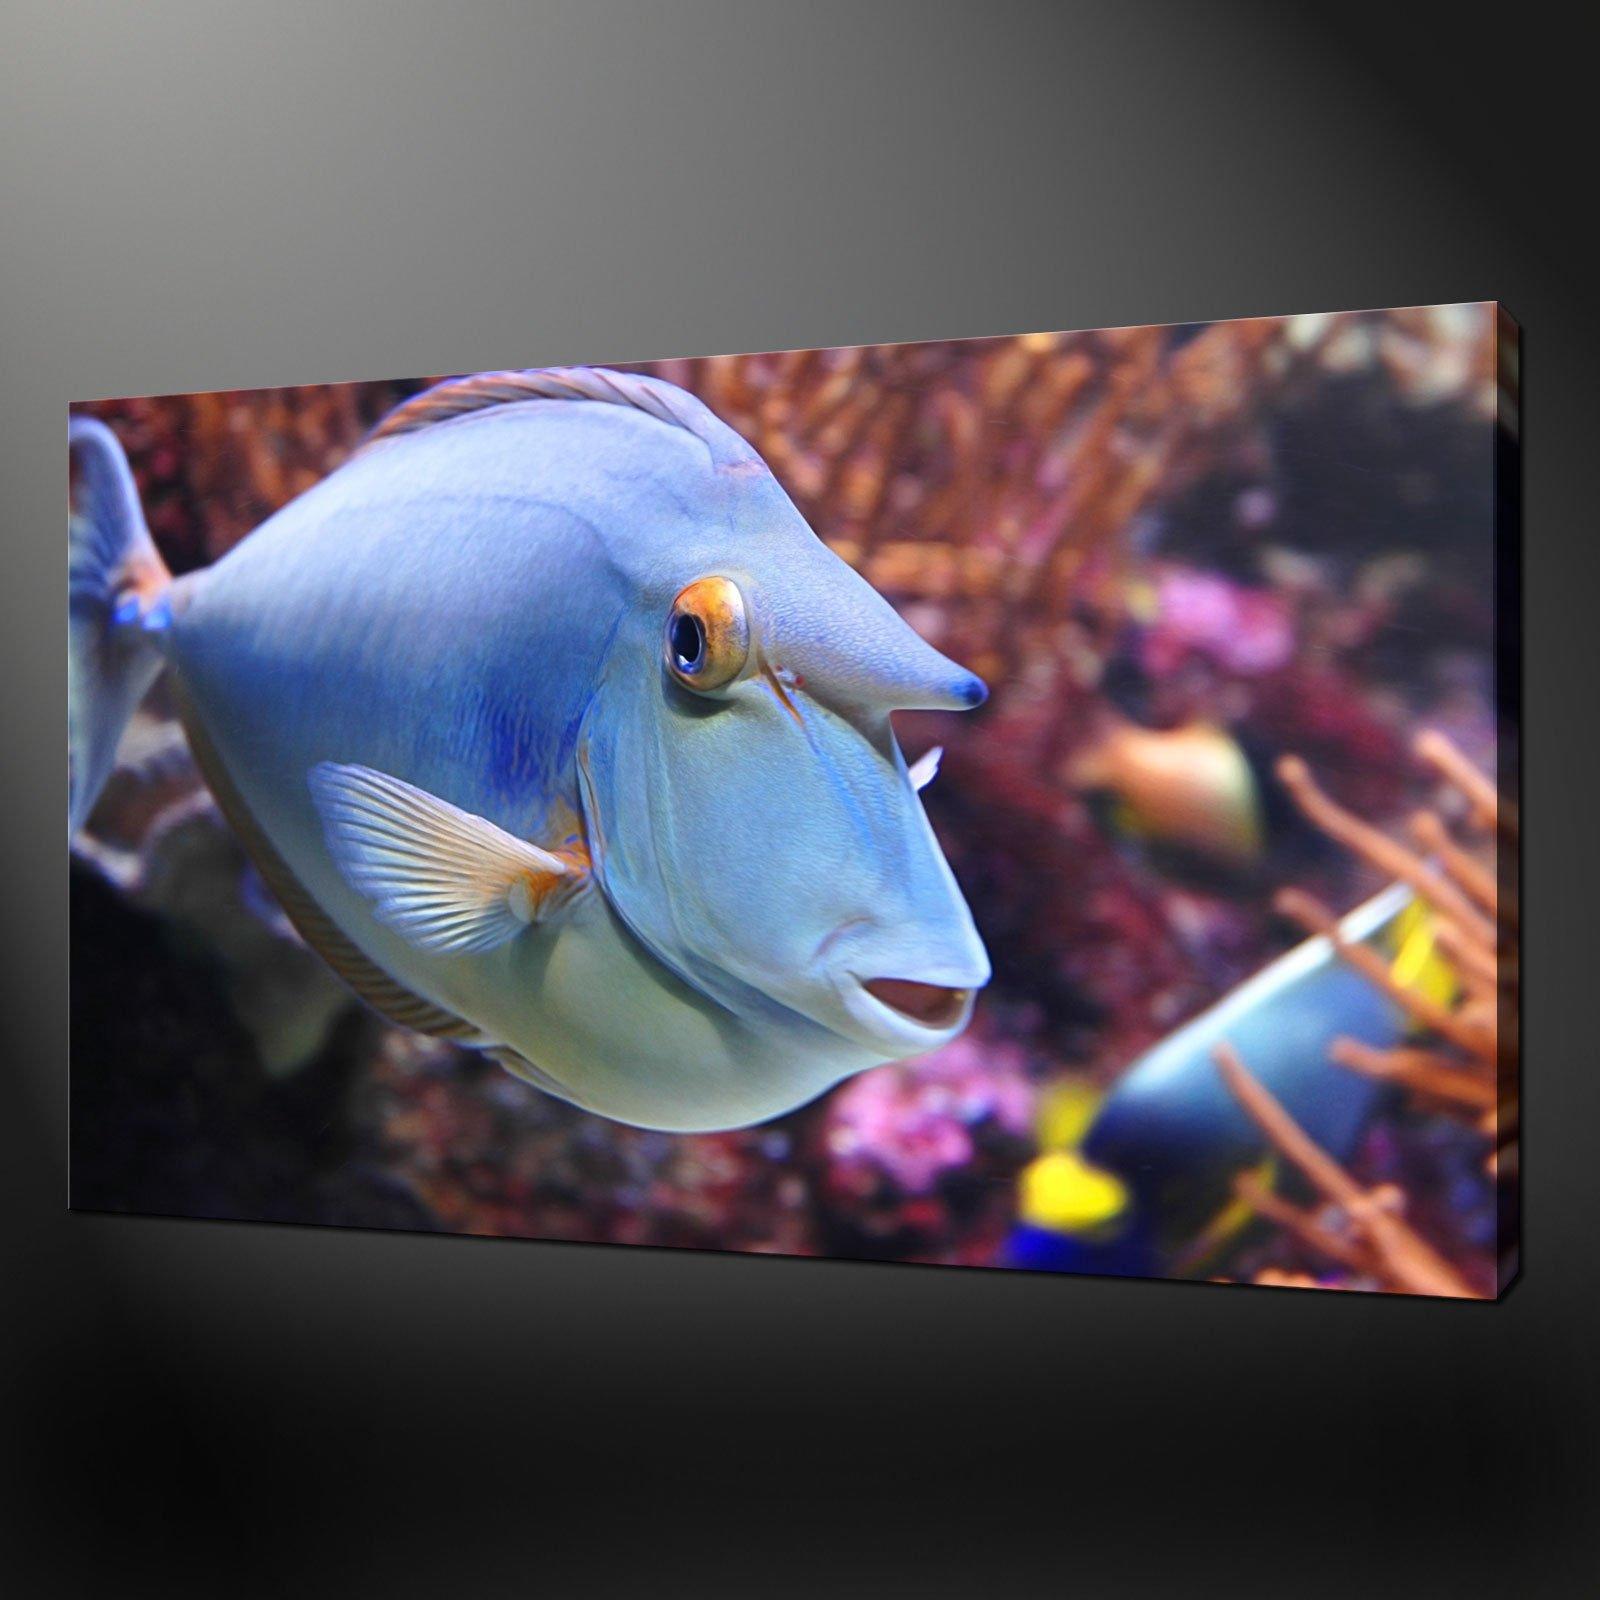 Freshwater aquarium fish uk -  Tropical Fish Modern Design Poster Picture Canvas Print